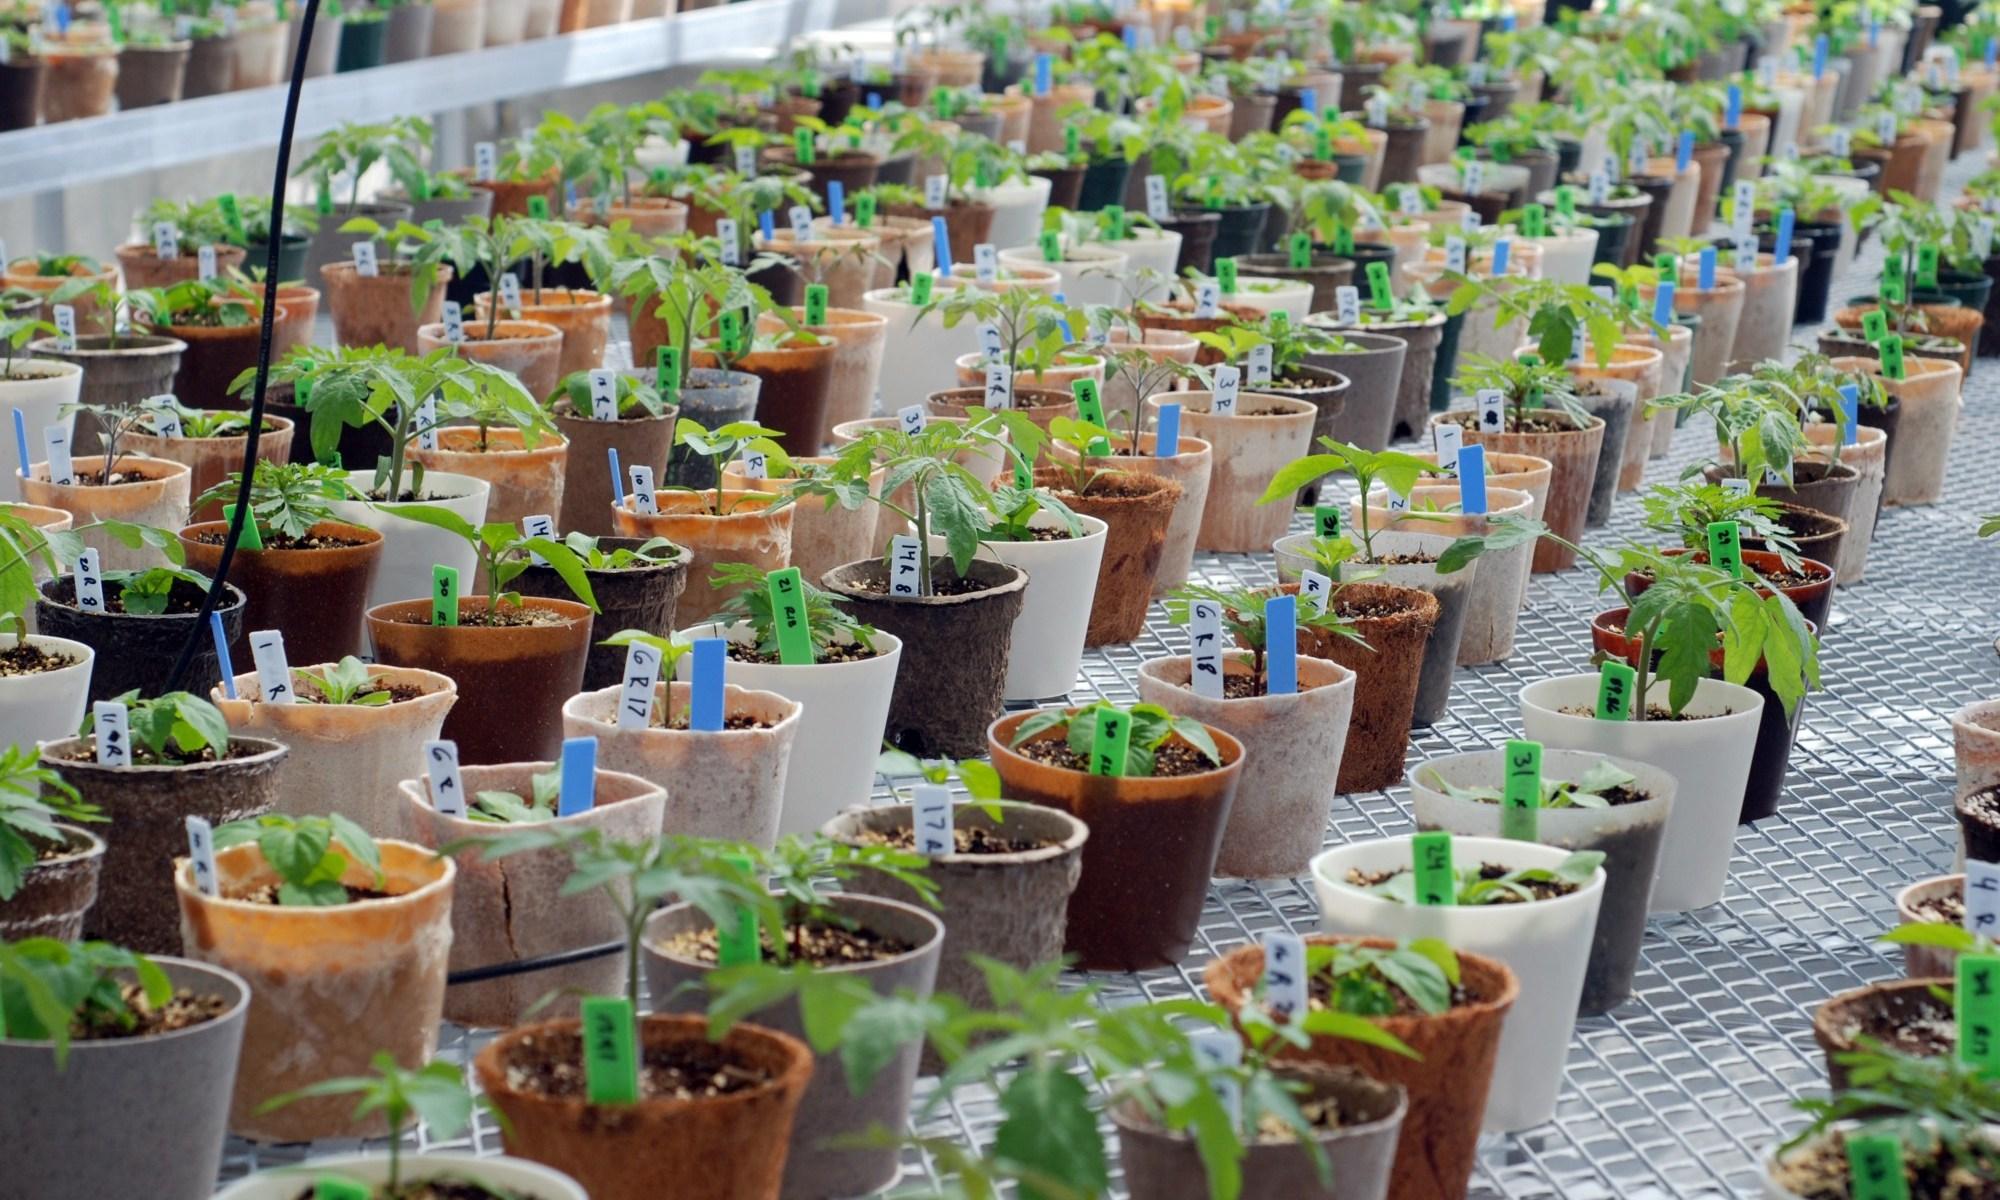 bioplastics plant pots